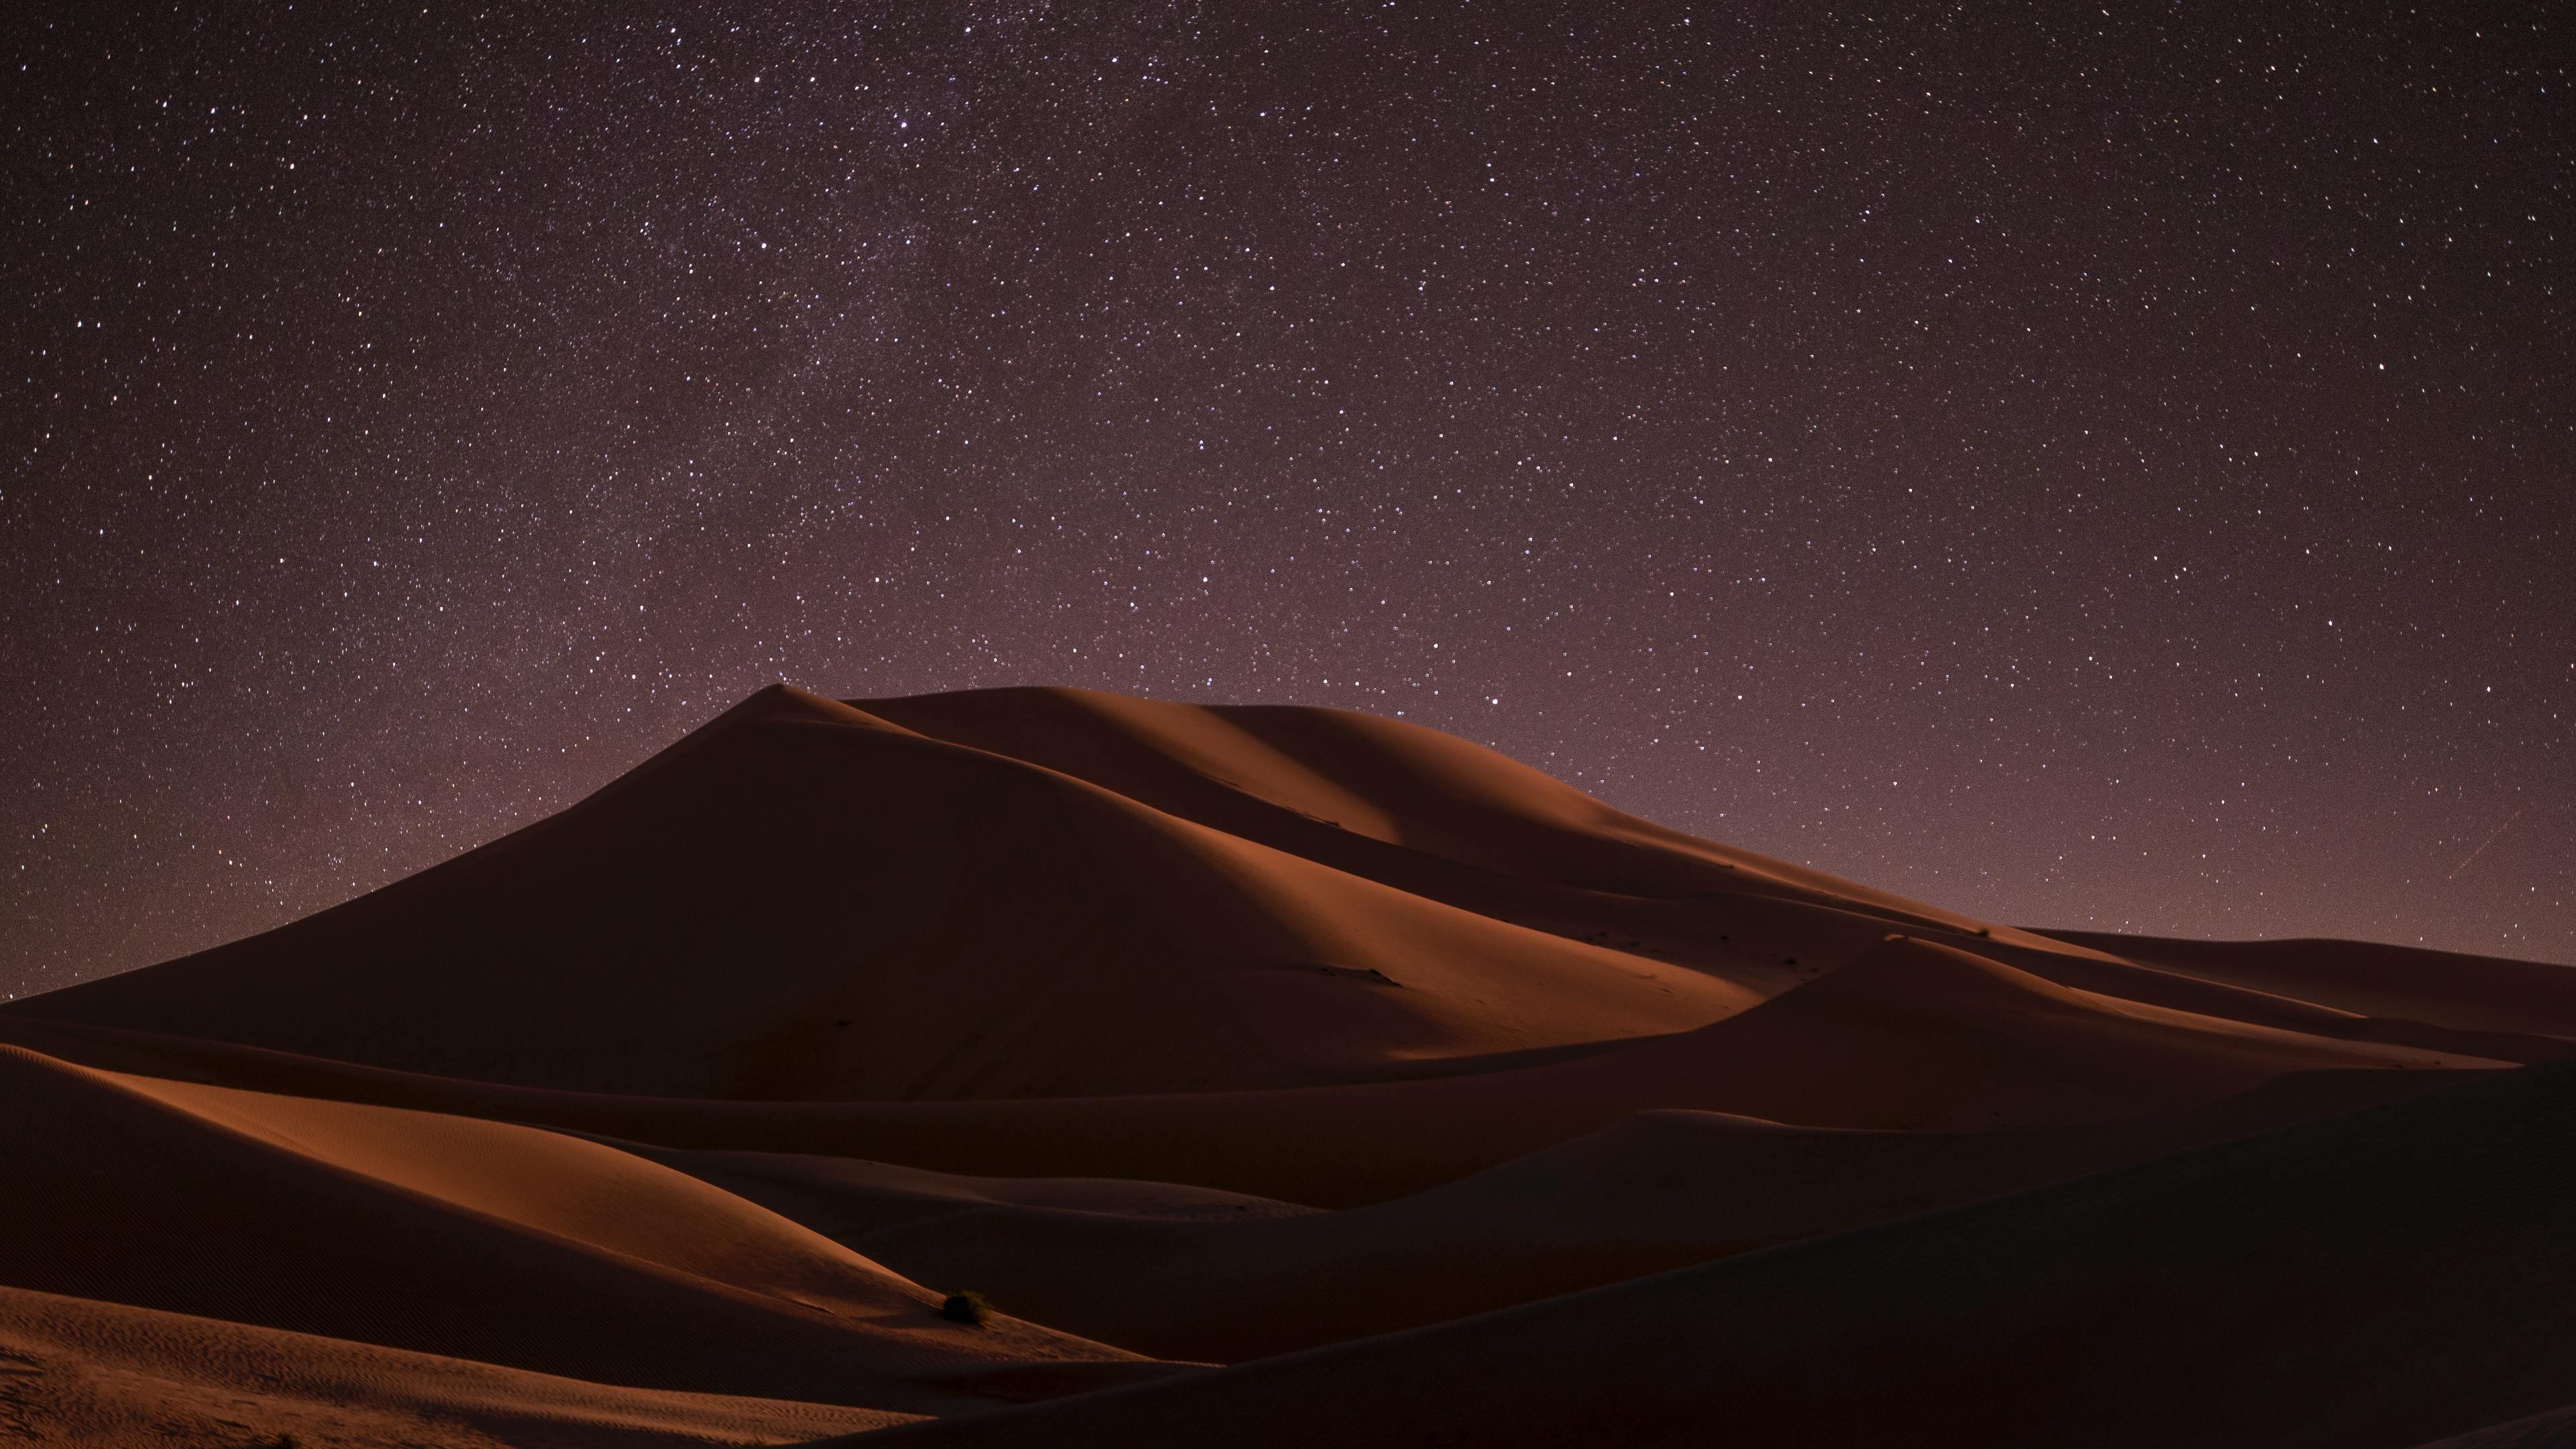 desert during night time 4k 1551644401 - Desert During Night Time 4k - night wallpapers, nature wallpapers, hd-wallpapers, desert wallpapers, 4k-wallpapers